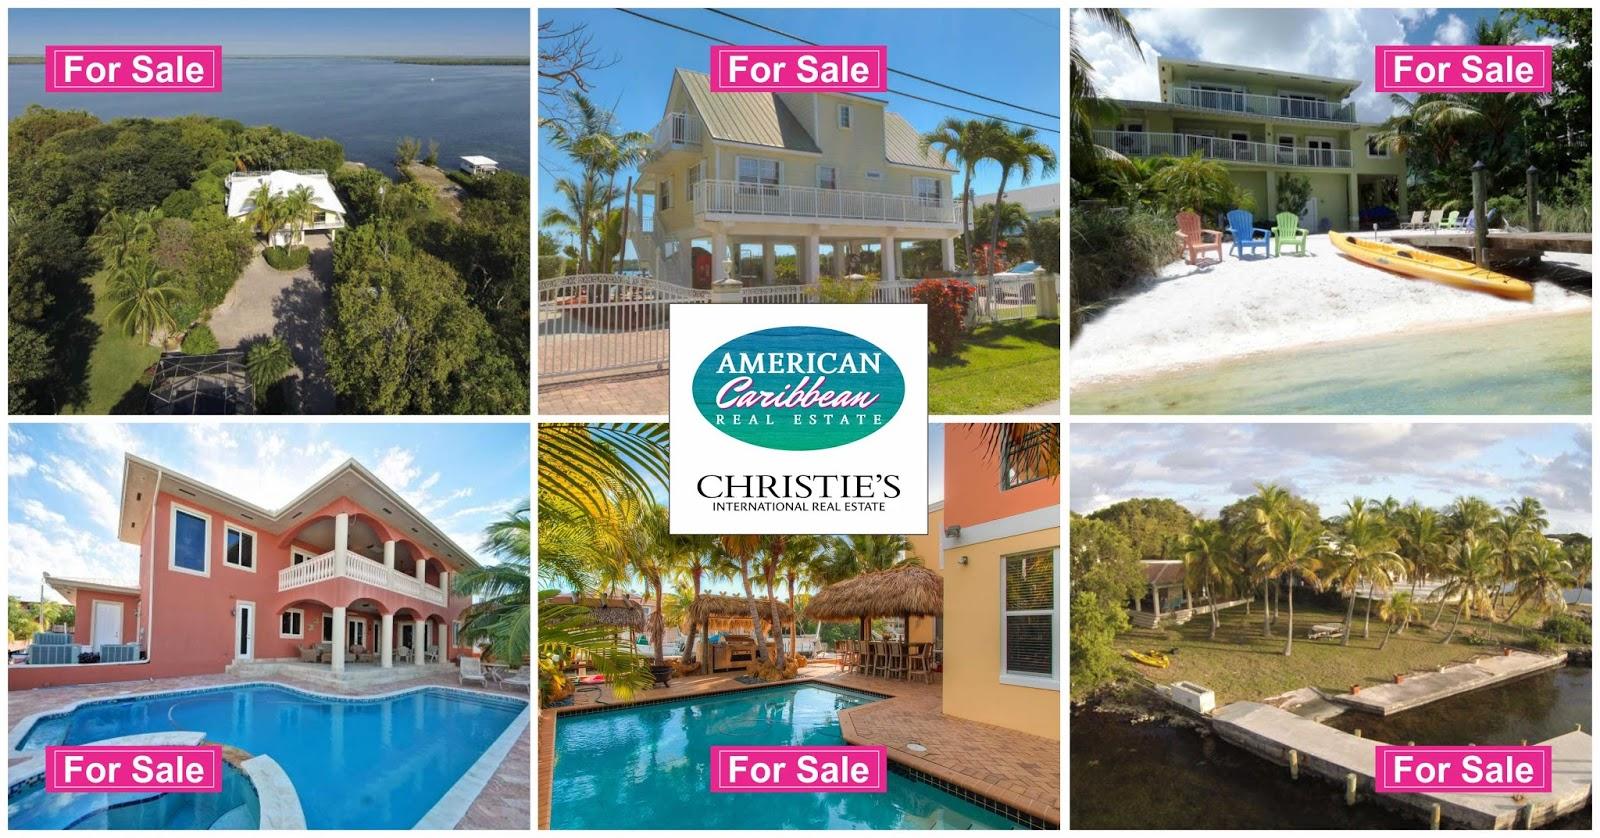 the florida keys real estate conchquistador july 2015